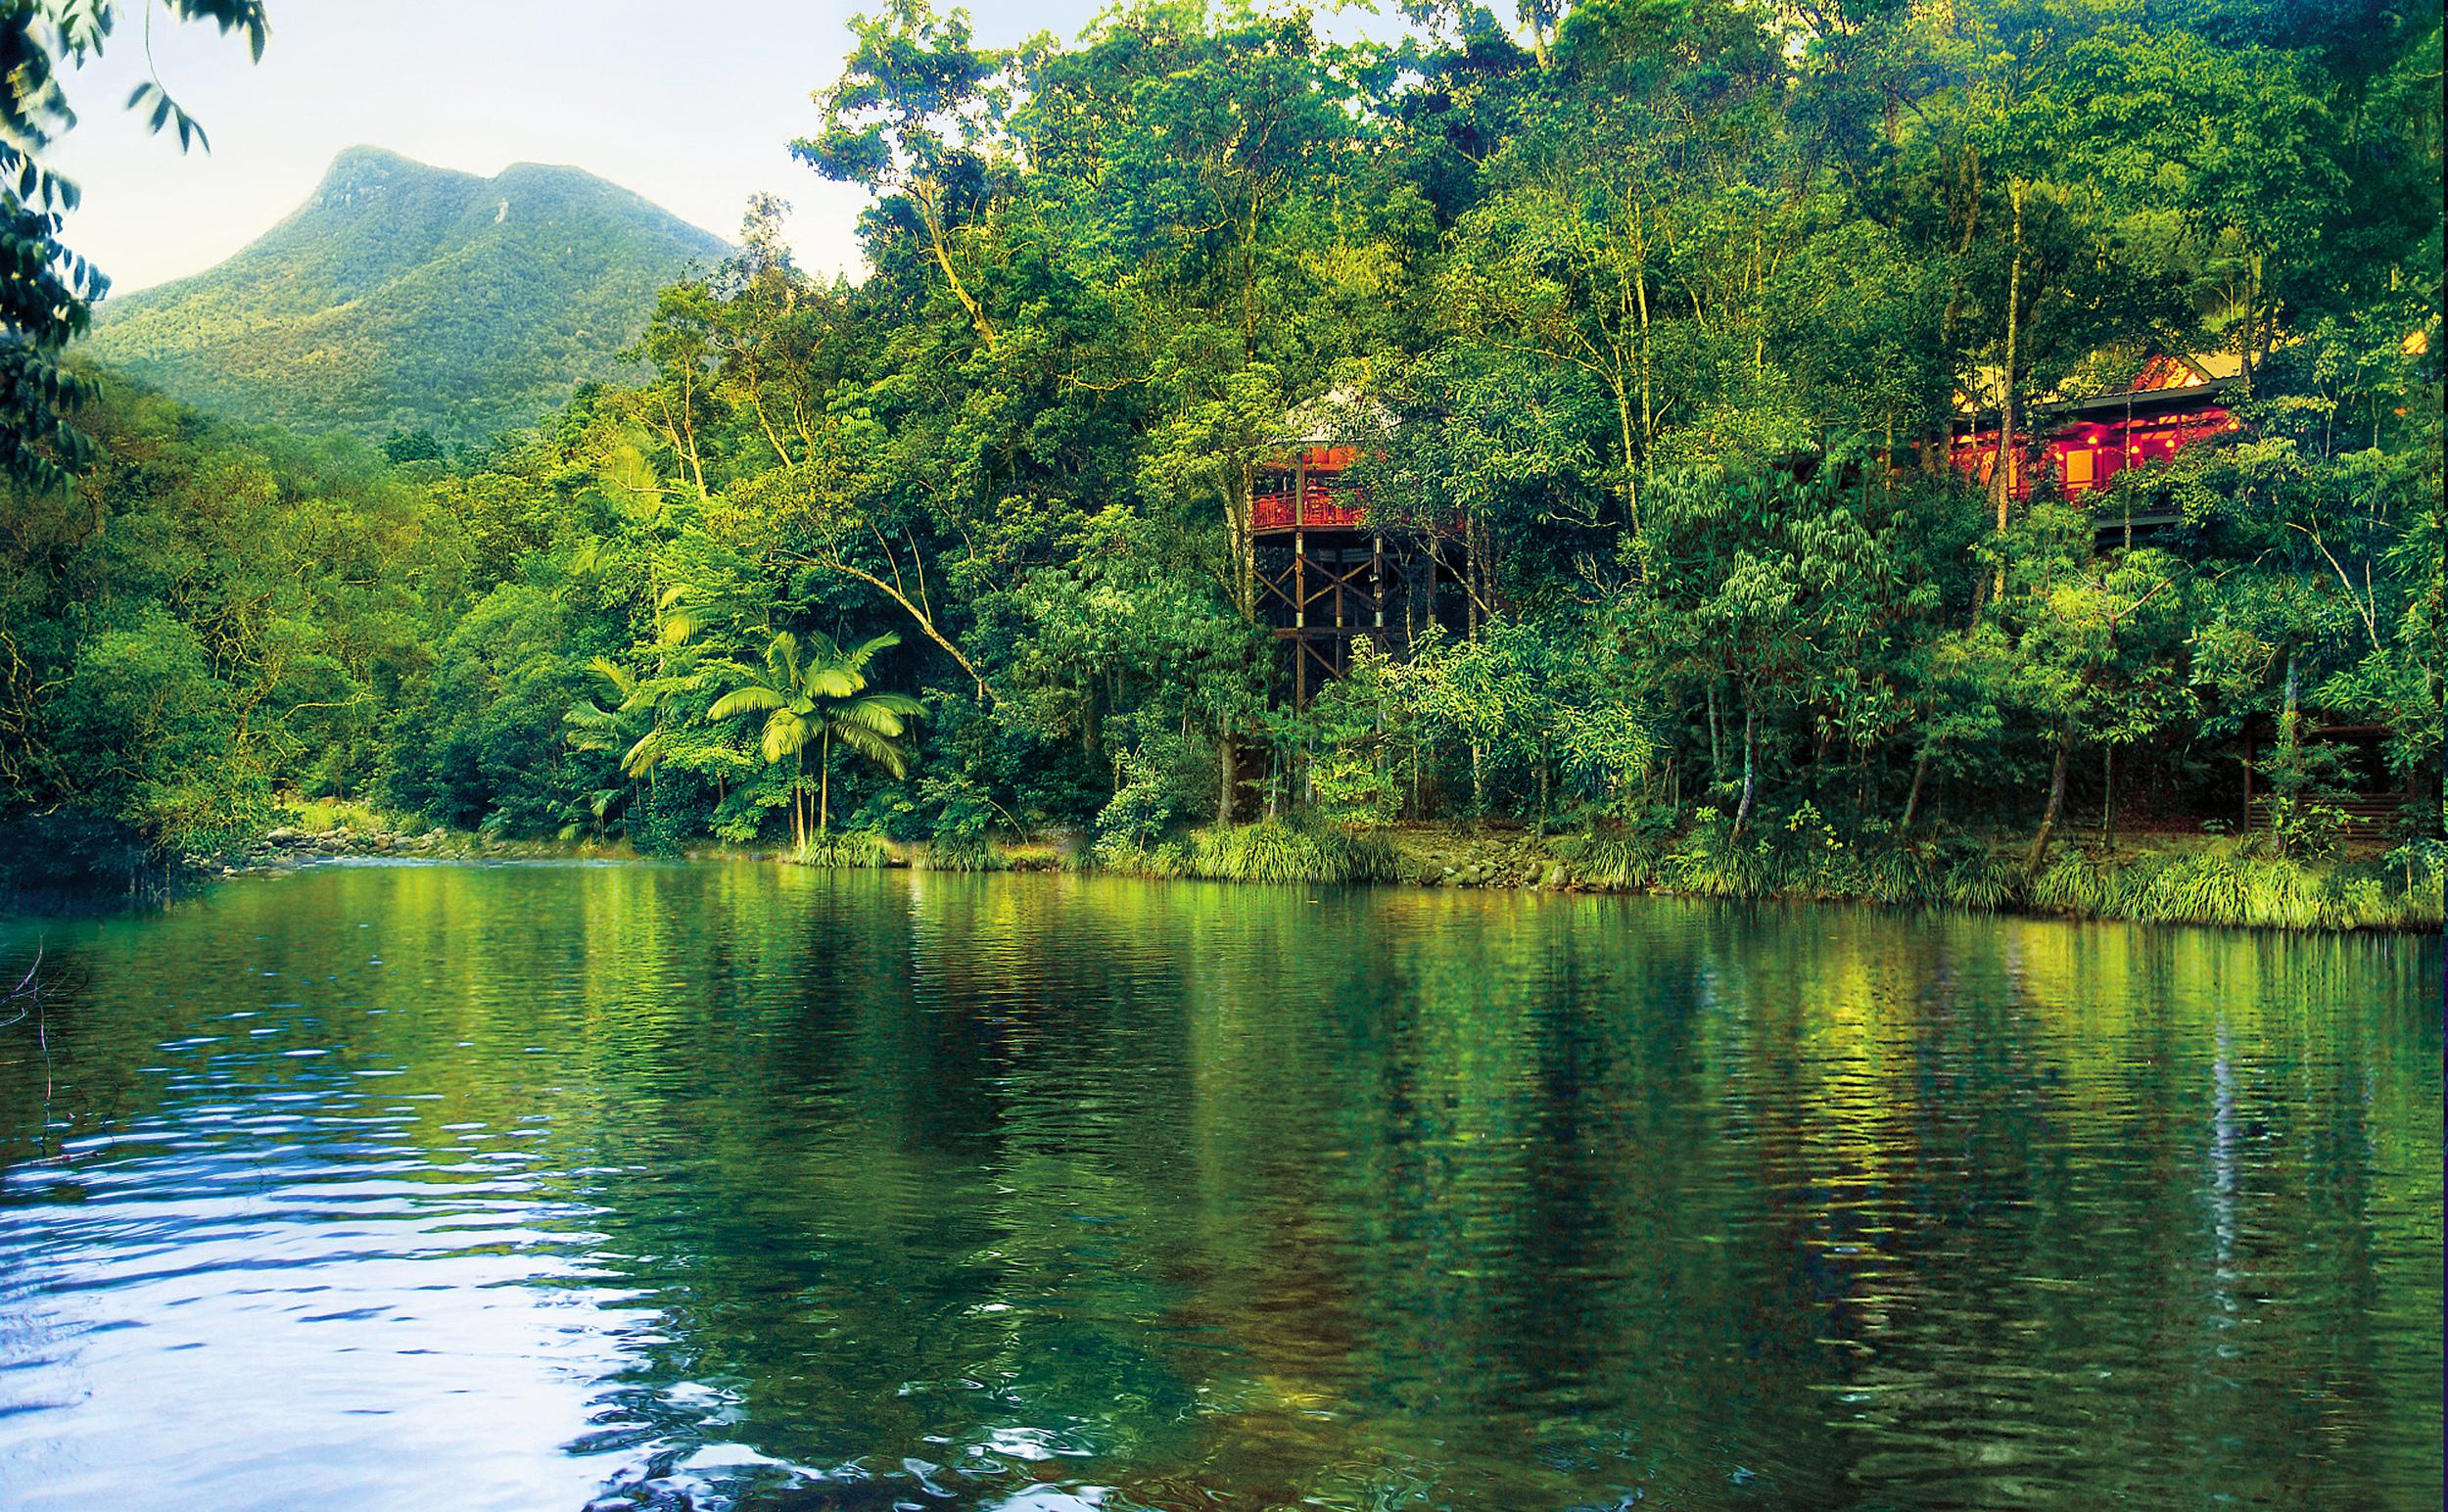 Silky Oaks Lodge - The Daintree - River Image Hero.jpg